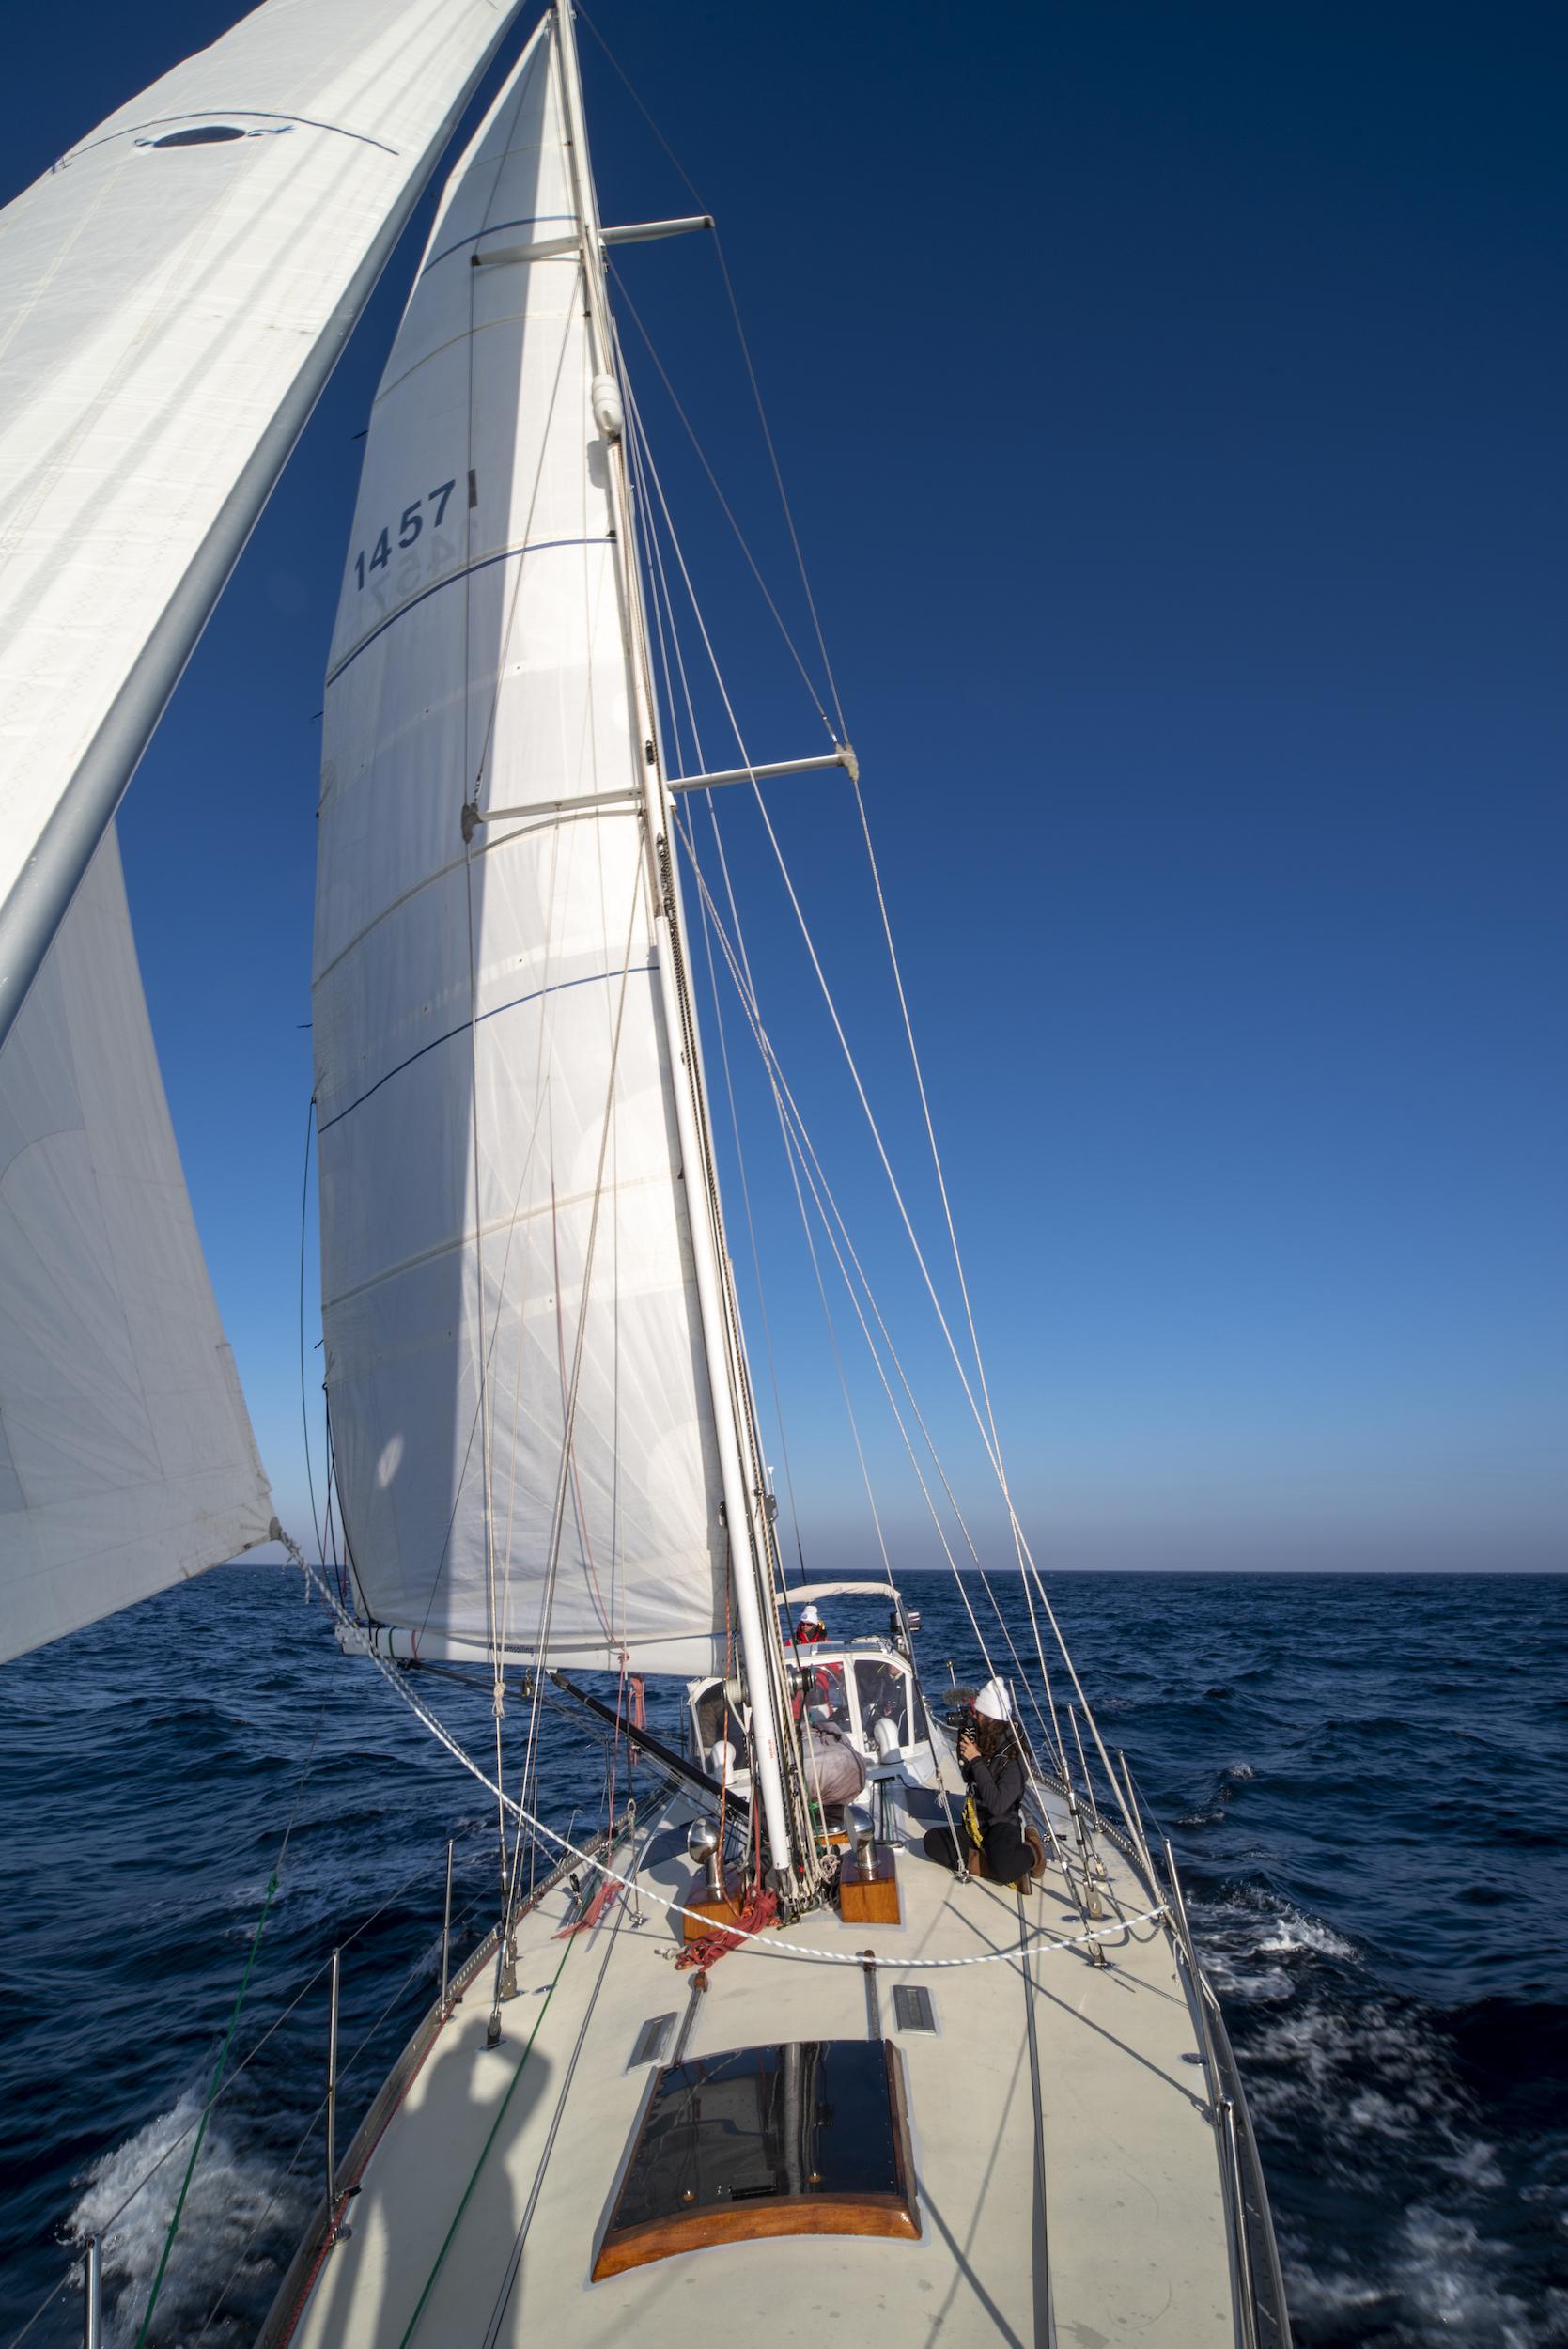 Offshore North Sea_12.jpg